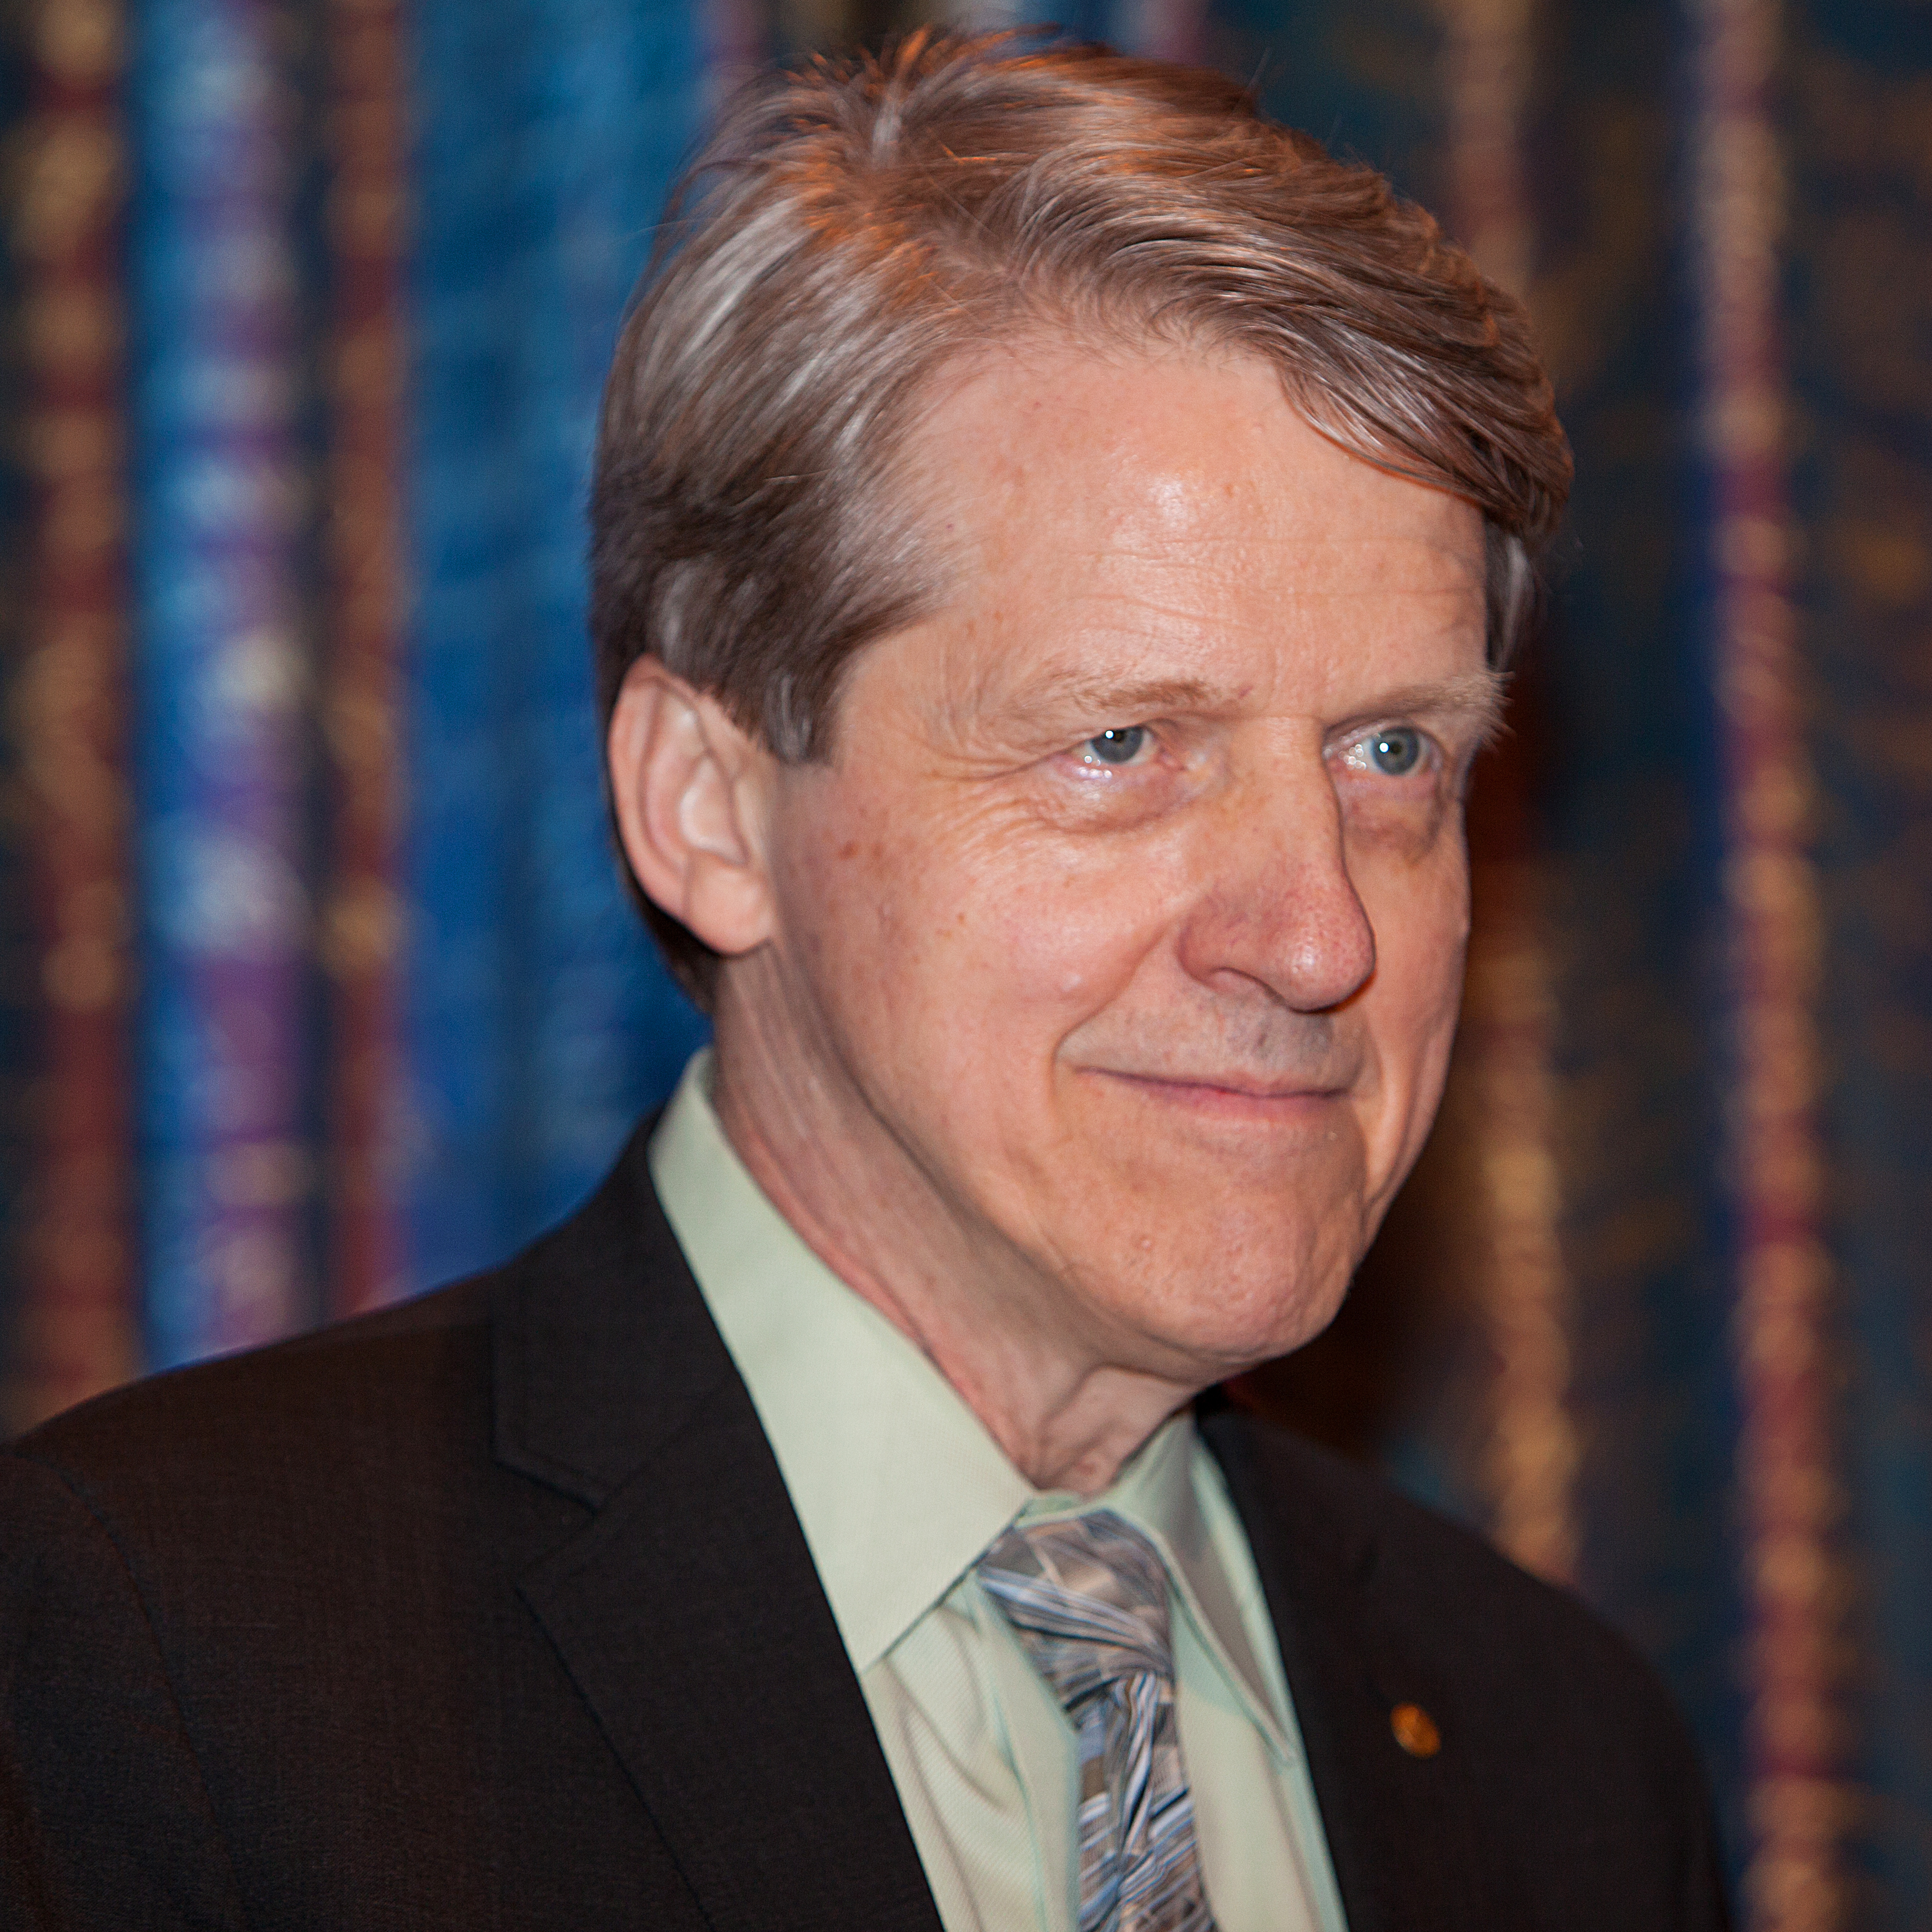 Bob Schiller Robert J Shiller Wikipedia the free encyclopedia